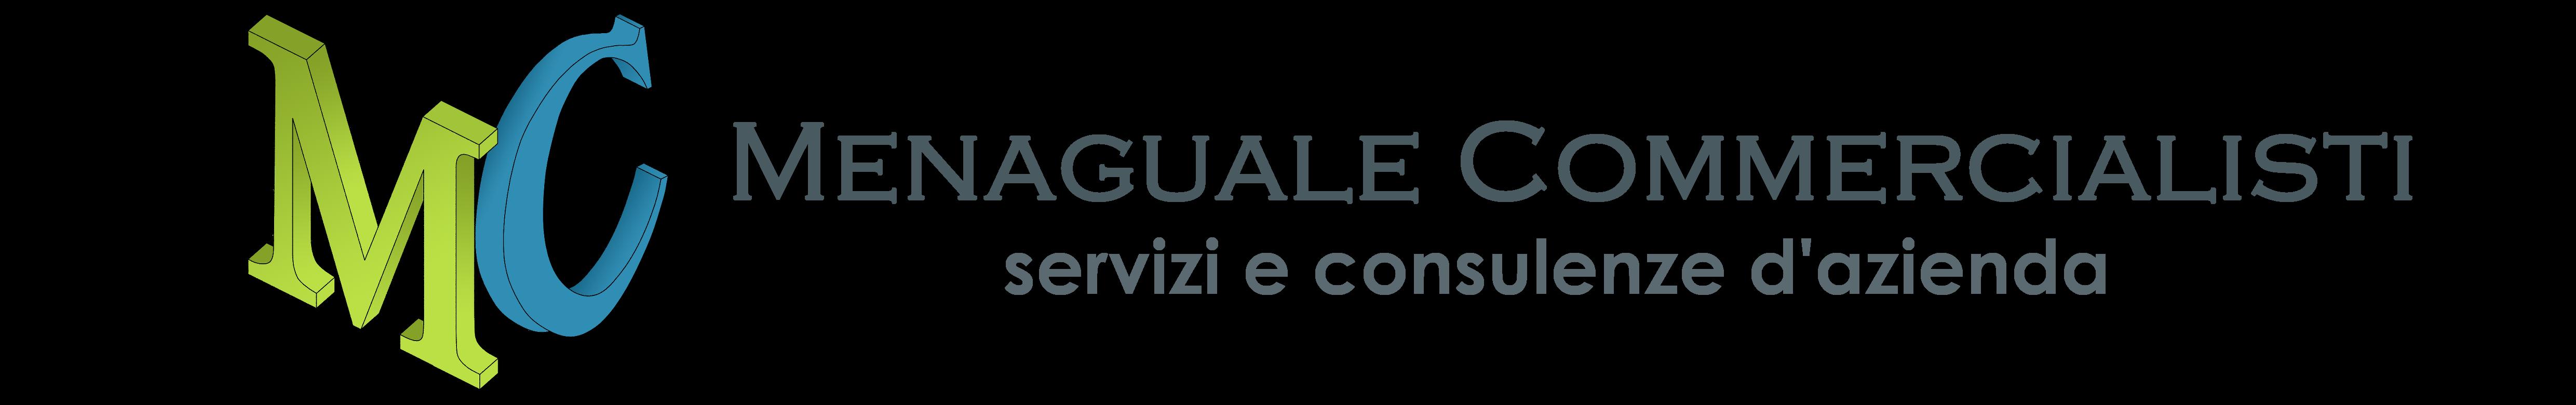 Menaguale Commercialisti